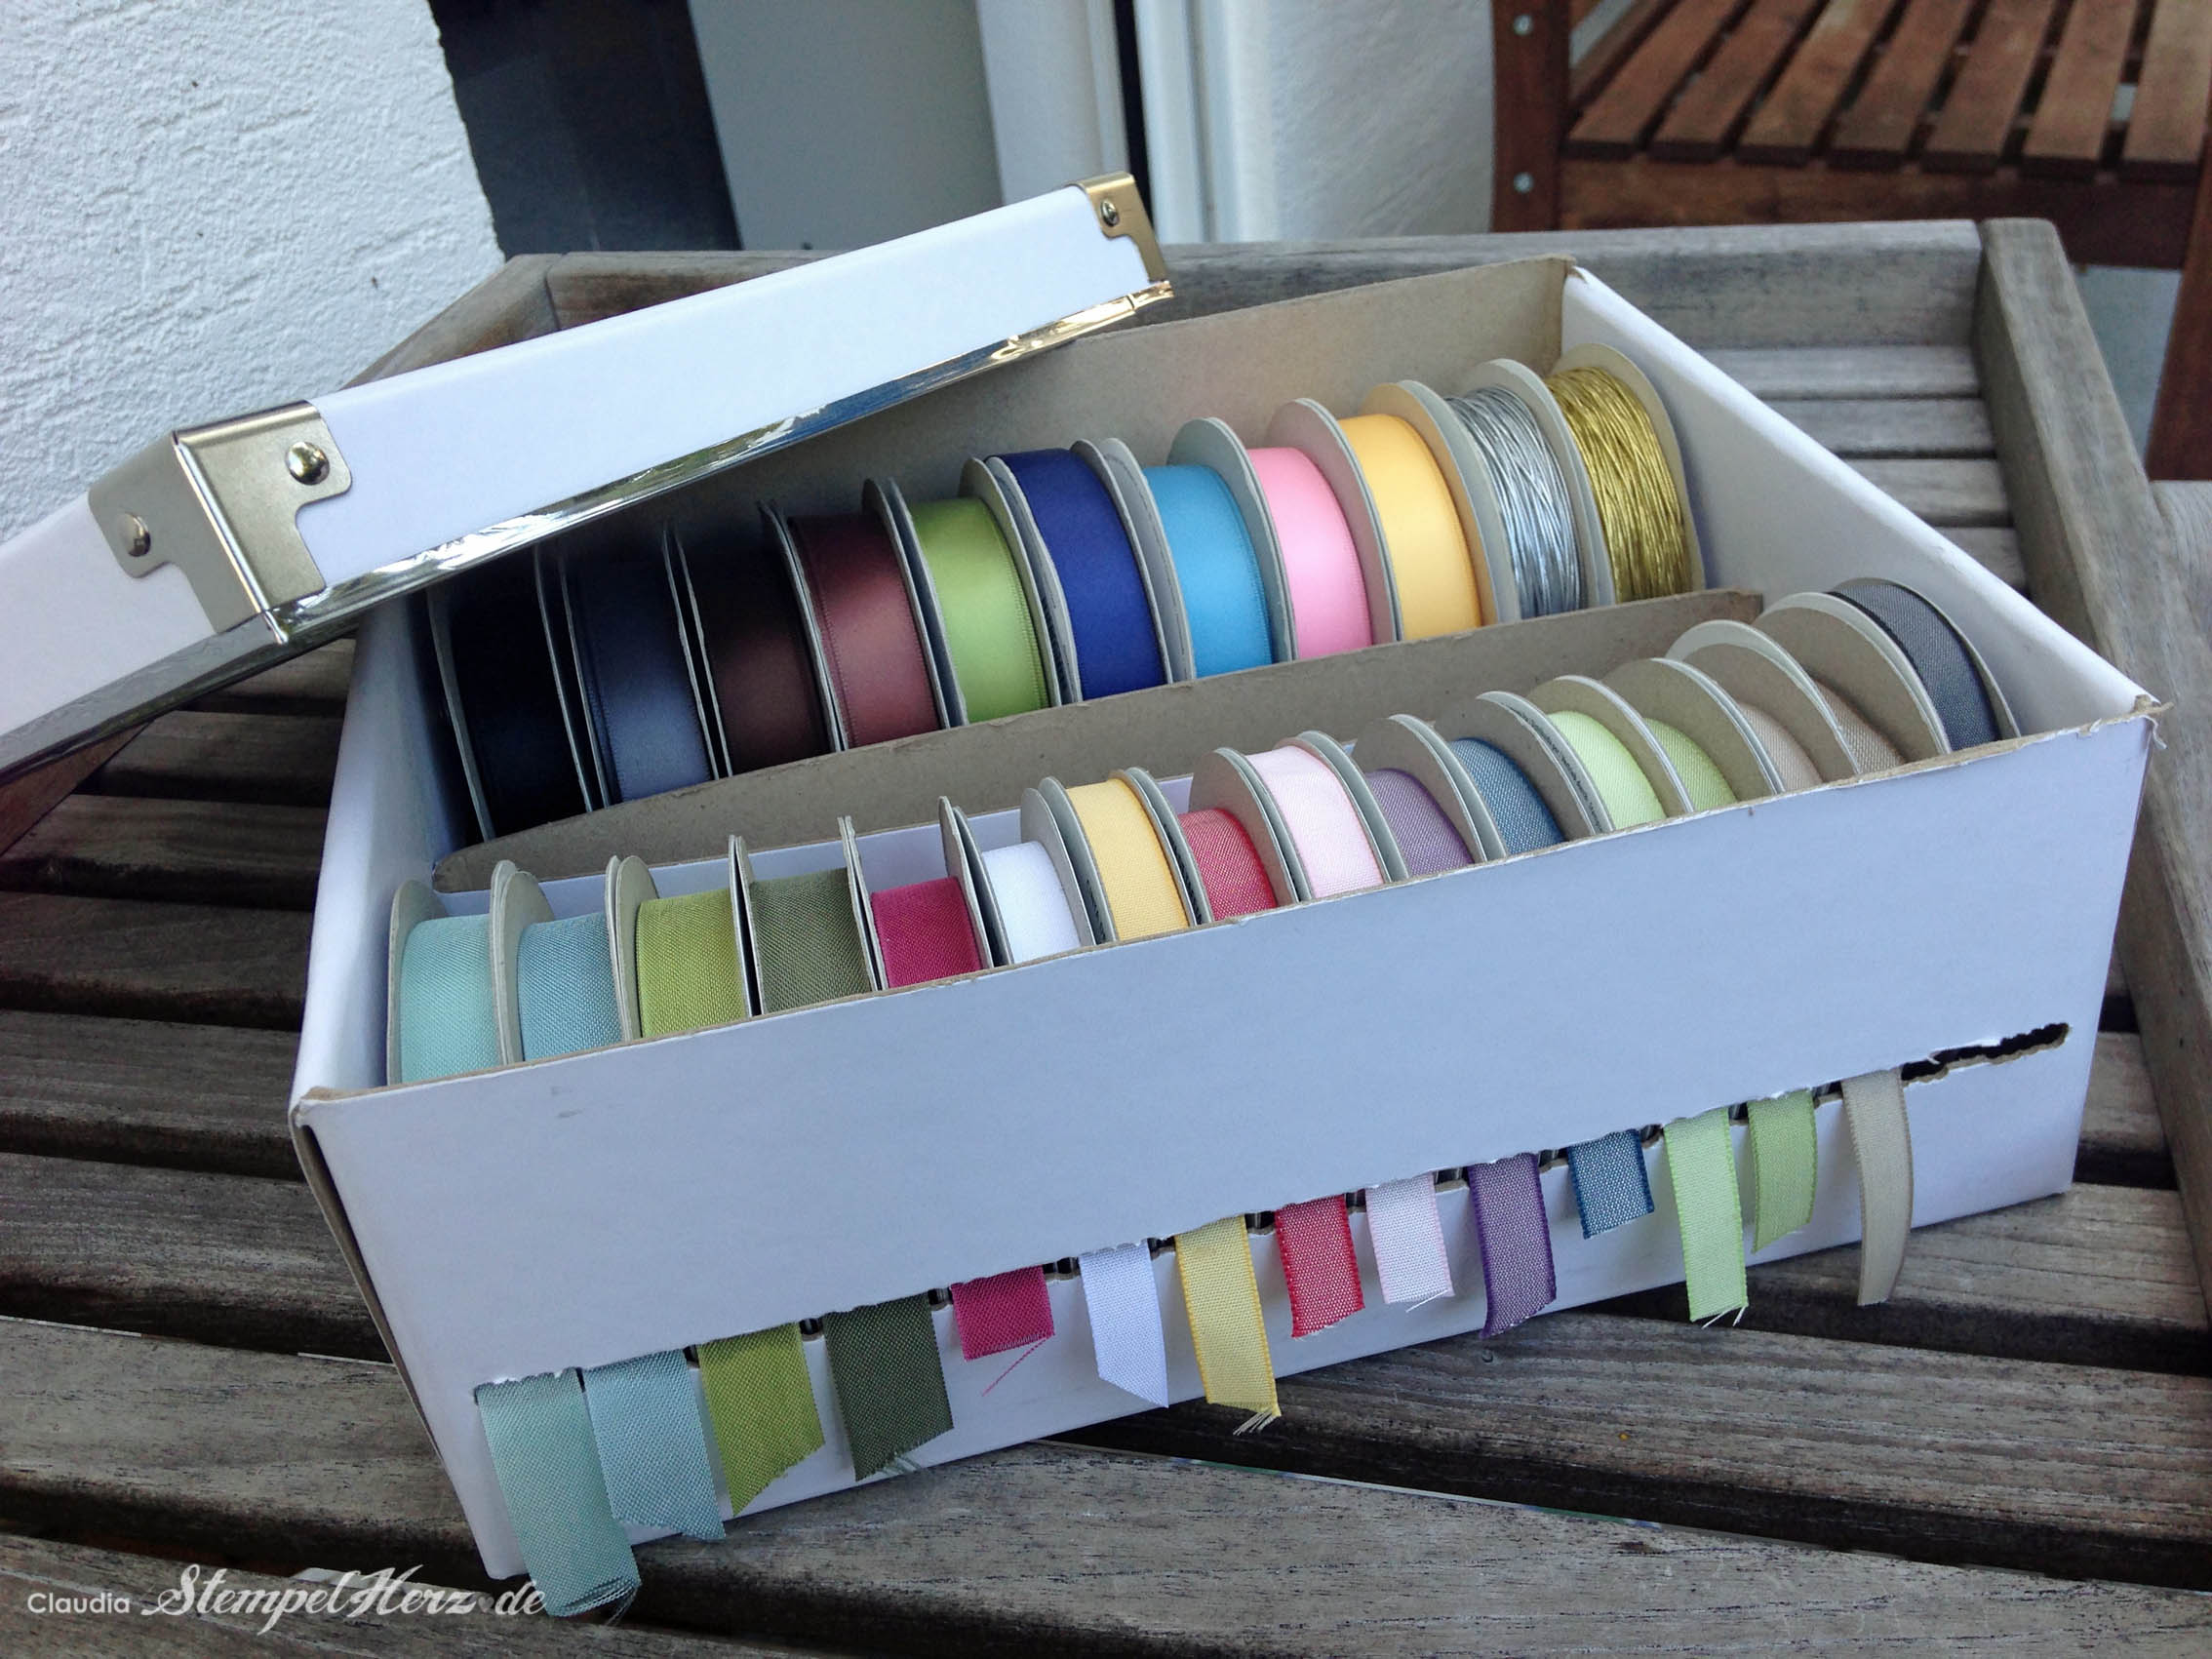 stampin up stempelherz ikea box baenderbox tip aufbewahrung baender ribbonbox 03. Black Bedroom Furniture Sets. Home Design Ideas